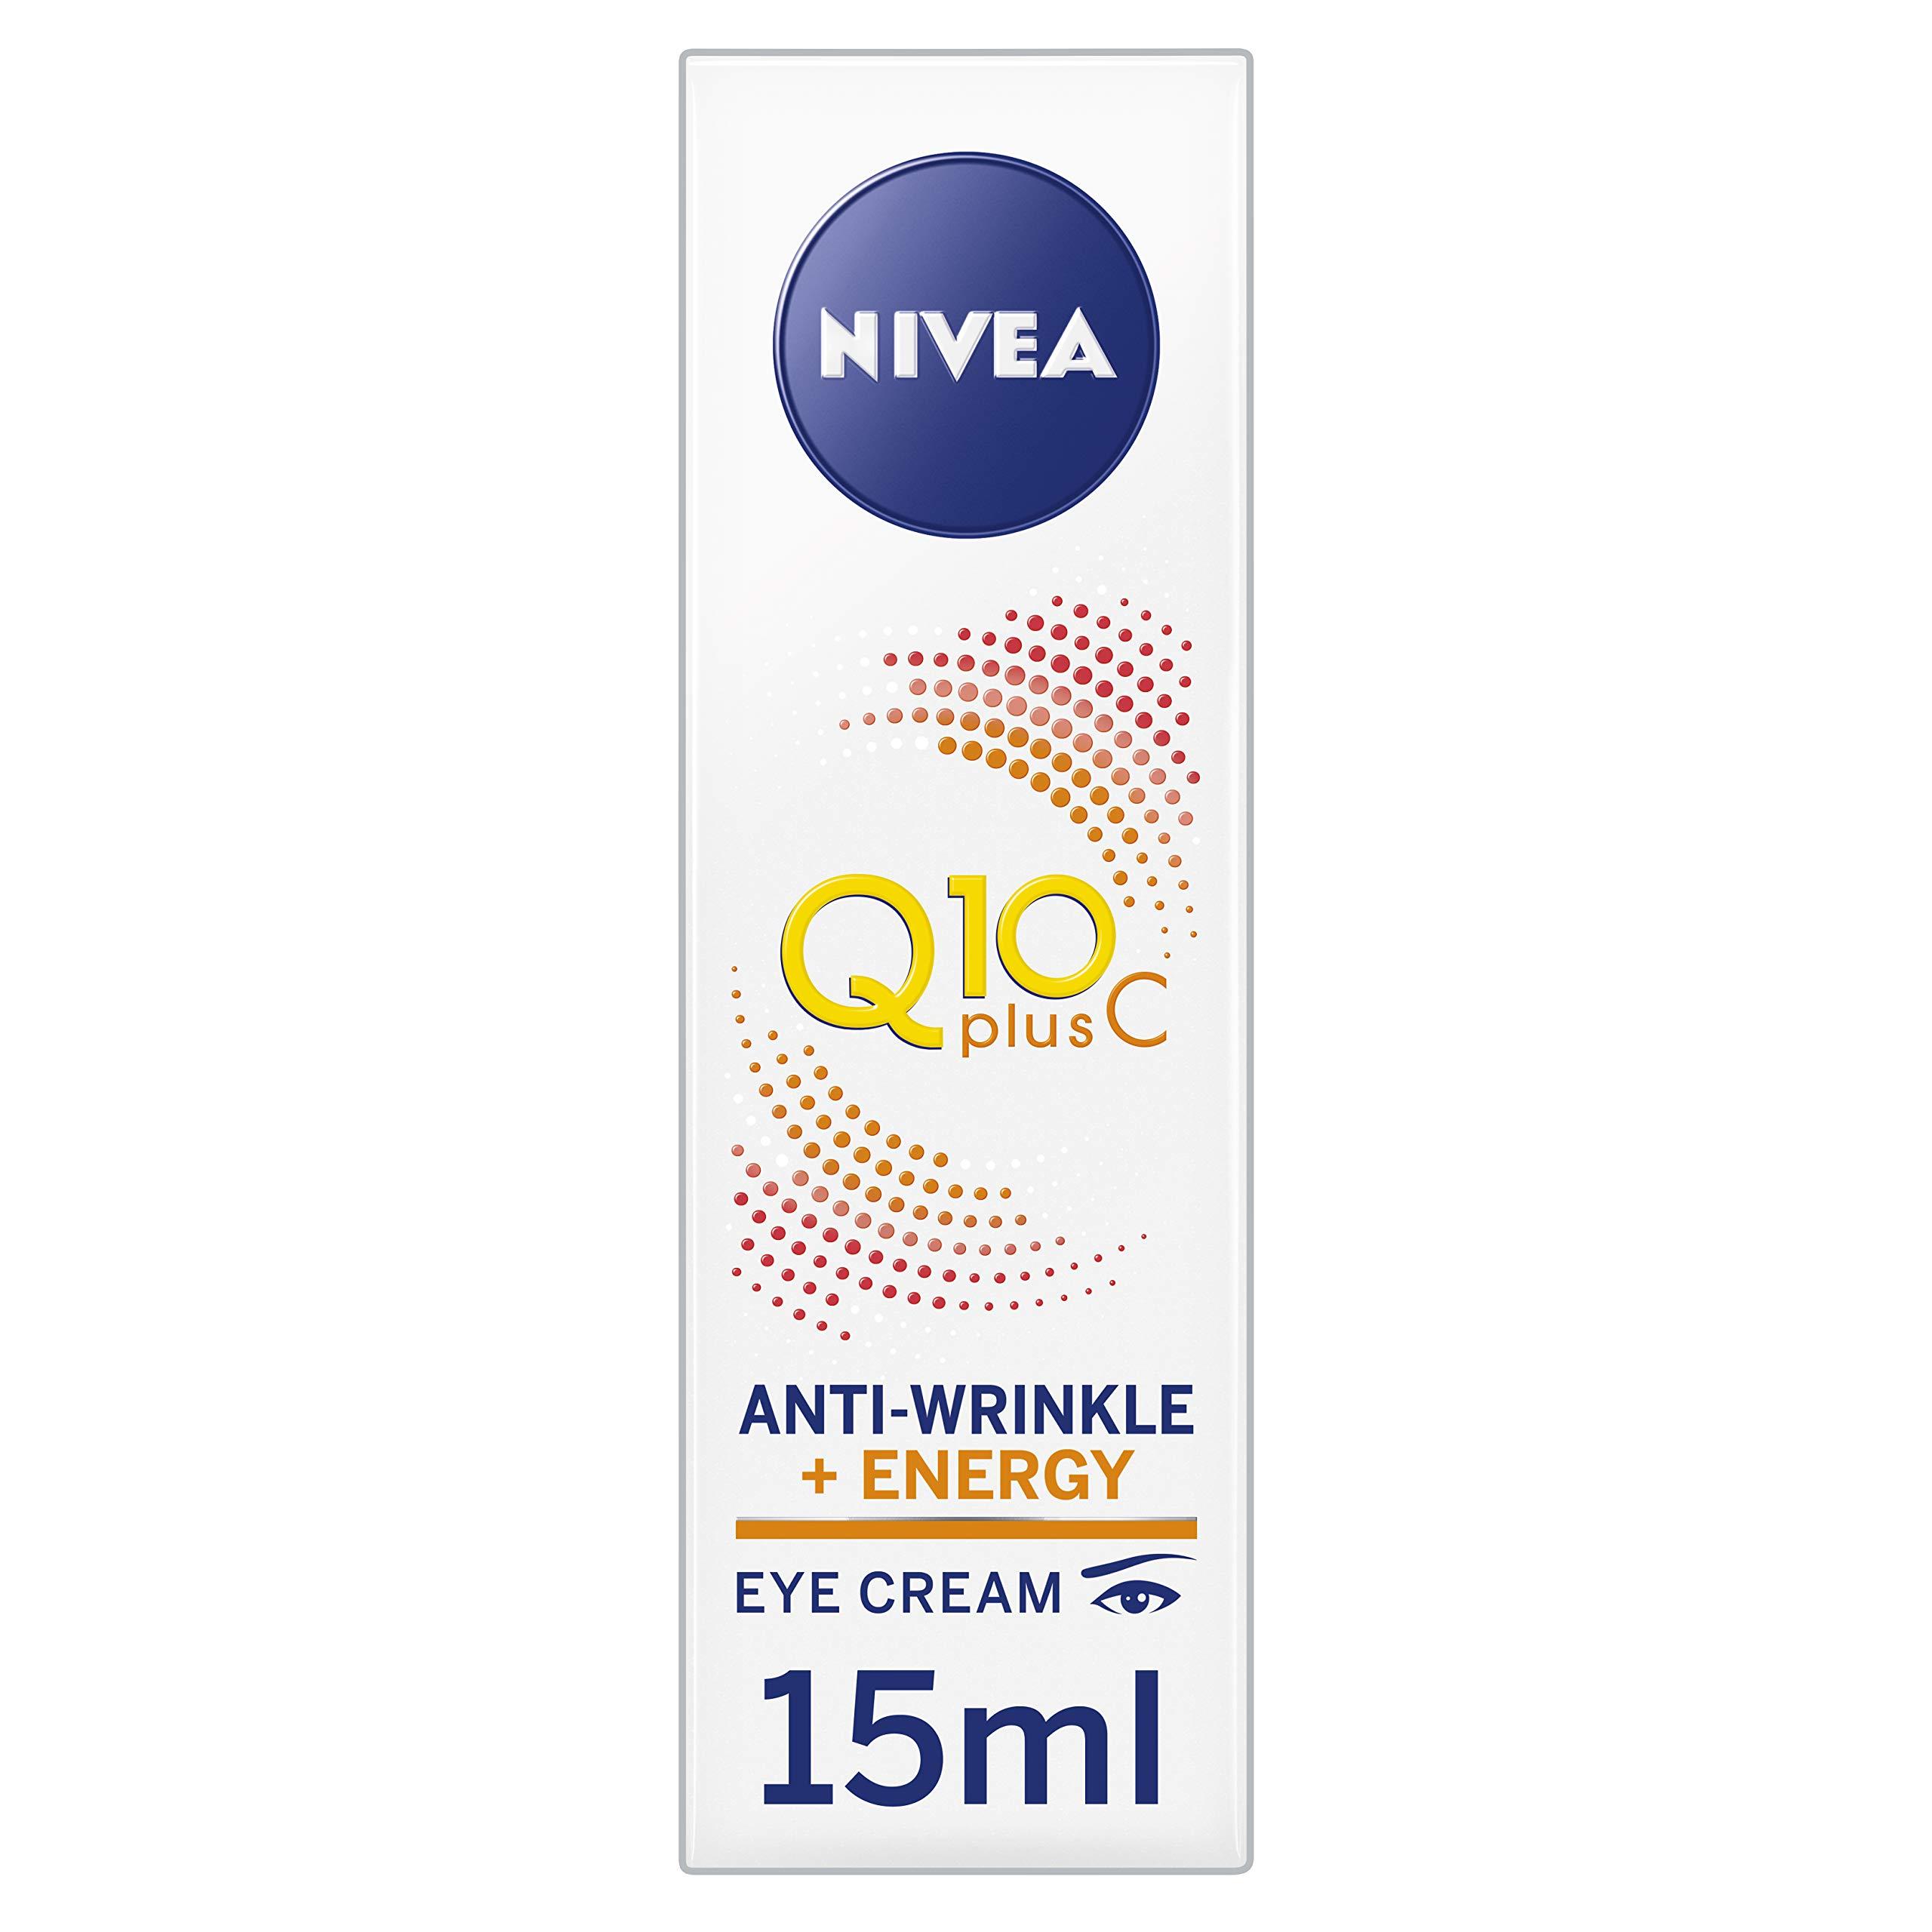 NIVEA Q10 Plus C Crema antiarrugas + Energy Eye Cream, crema para ojos antienvejecimiento con vitamina C y Q10 antioxidantes, uso diario, 15 ml